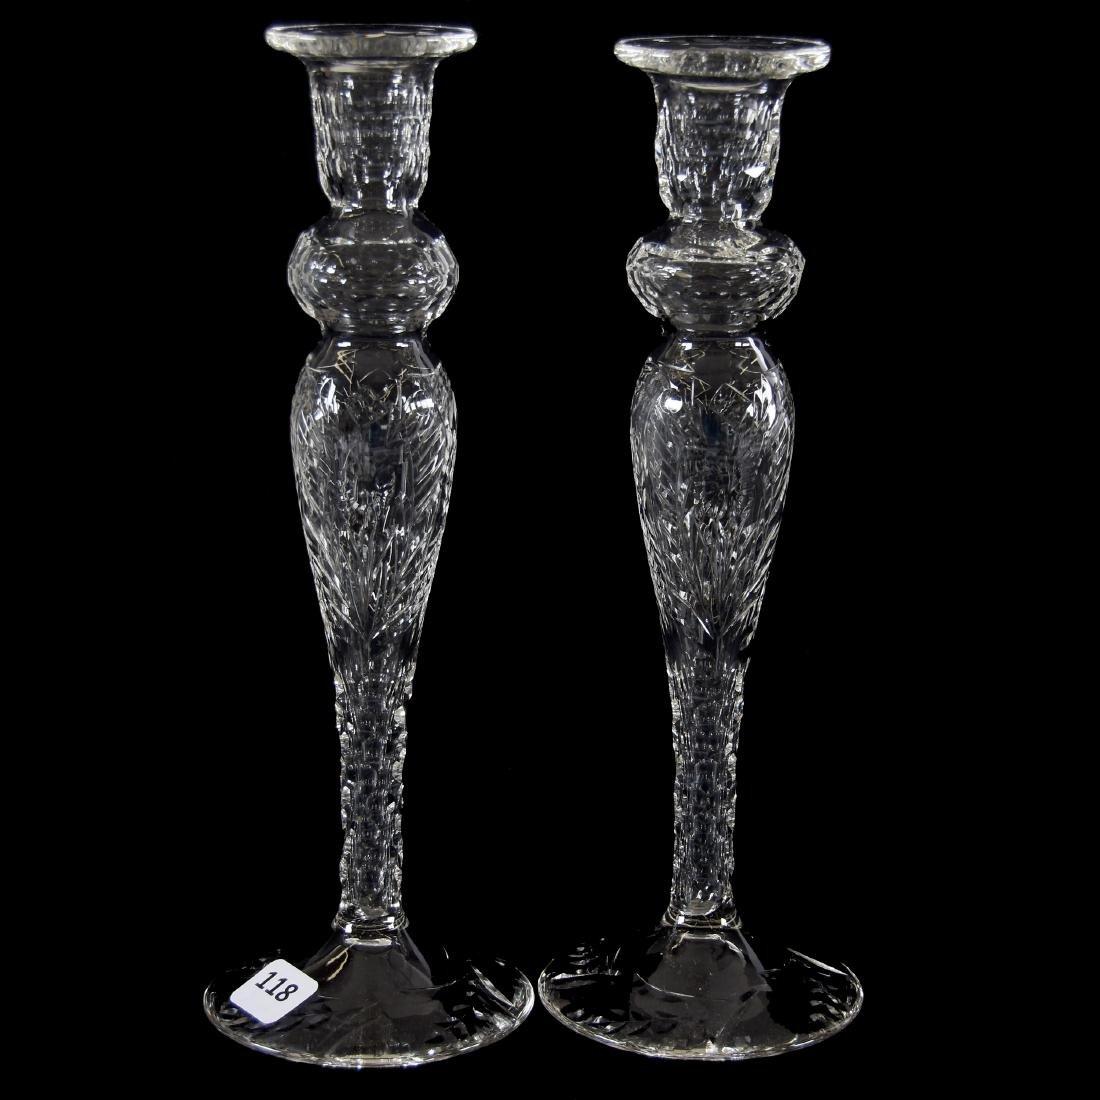 Pair Candlesticks, Engraved Floral